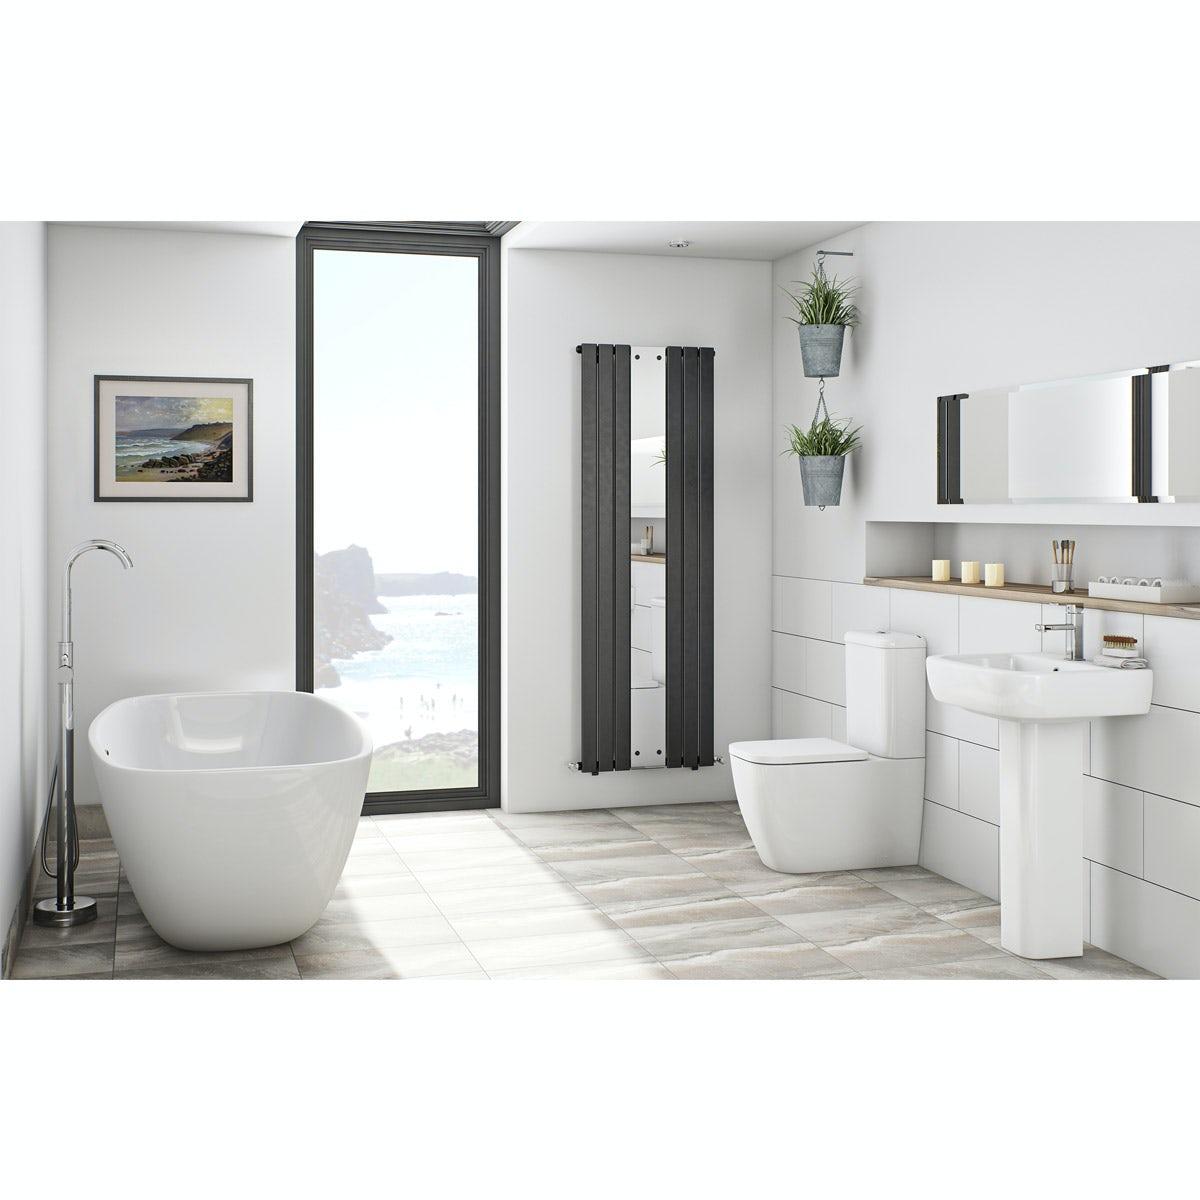 Mode Ellis Bathroom Suite With Freestanding Bath Victoriaplum Com